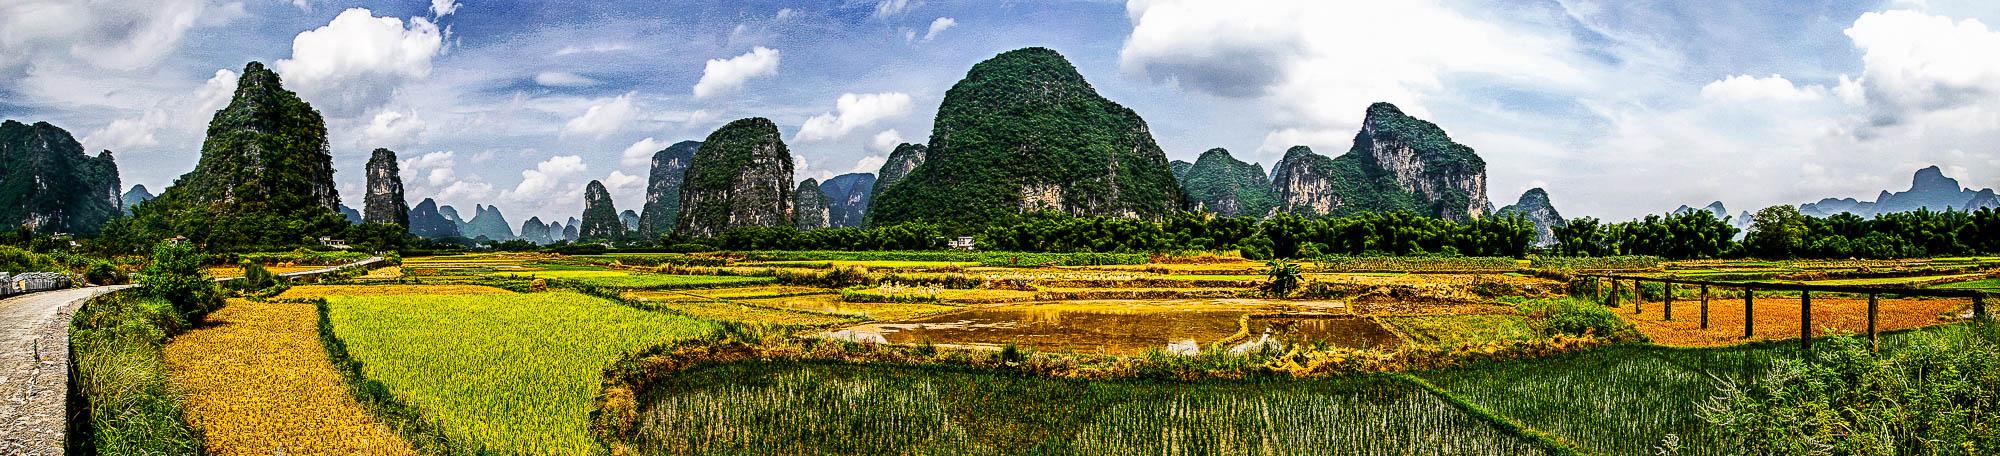 CHINA_Panoramas_jusmedic - 4